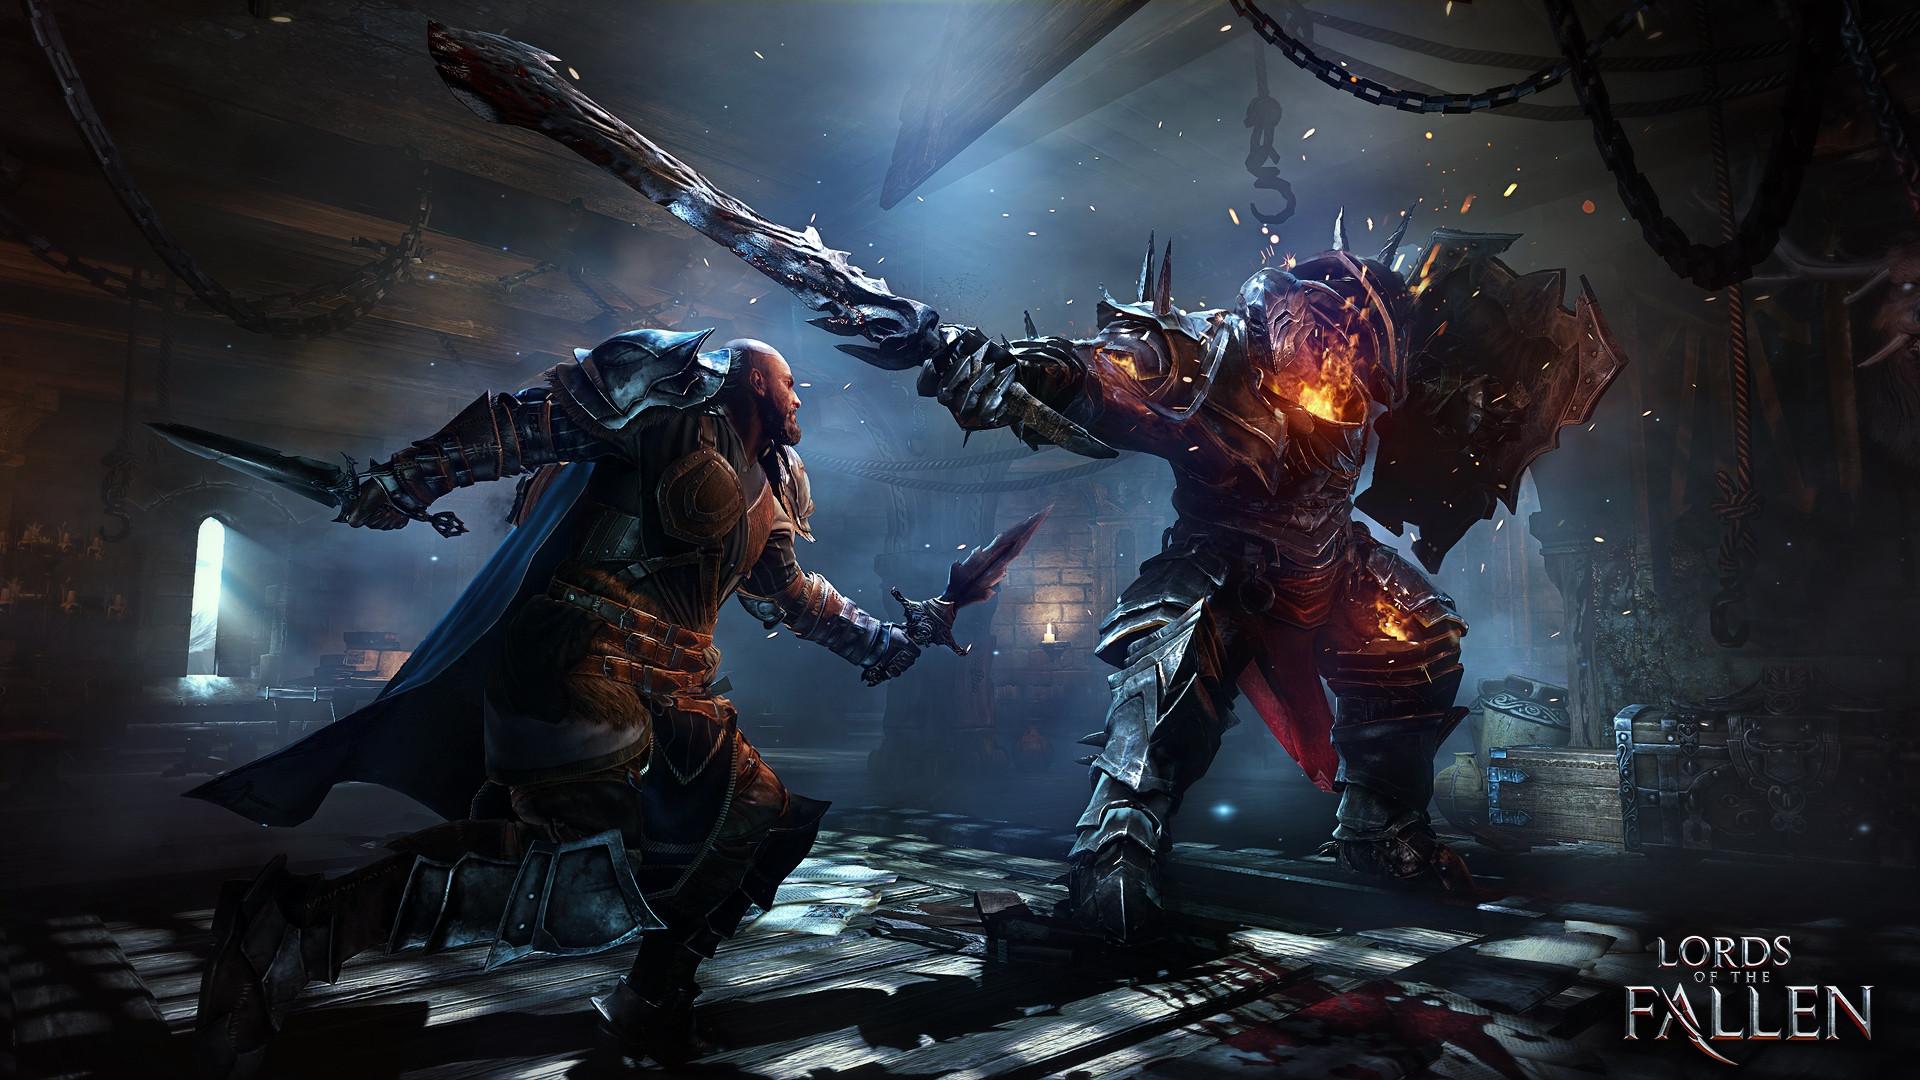 اسکرین شات جدید از Lords Of The Fallen | یوروگیمر